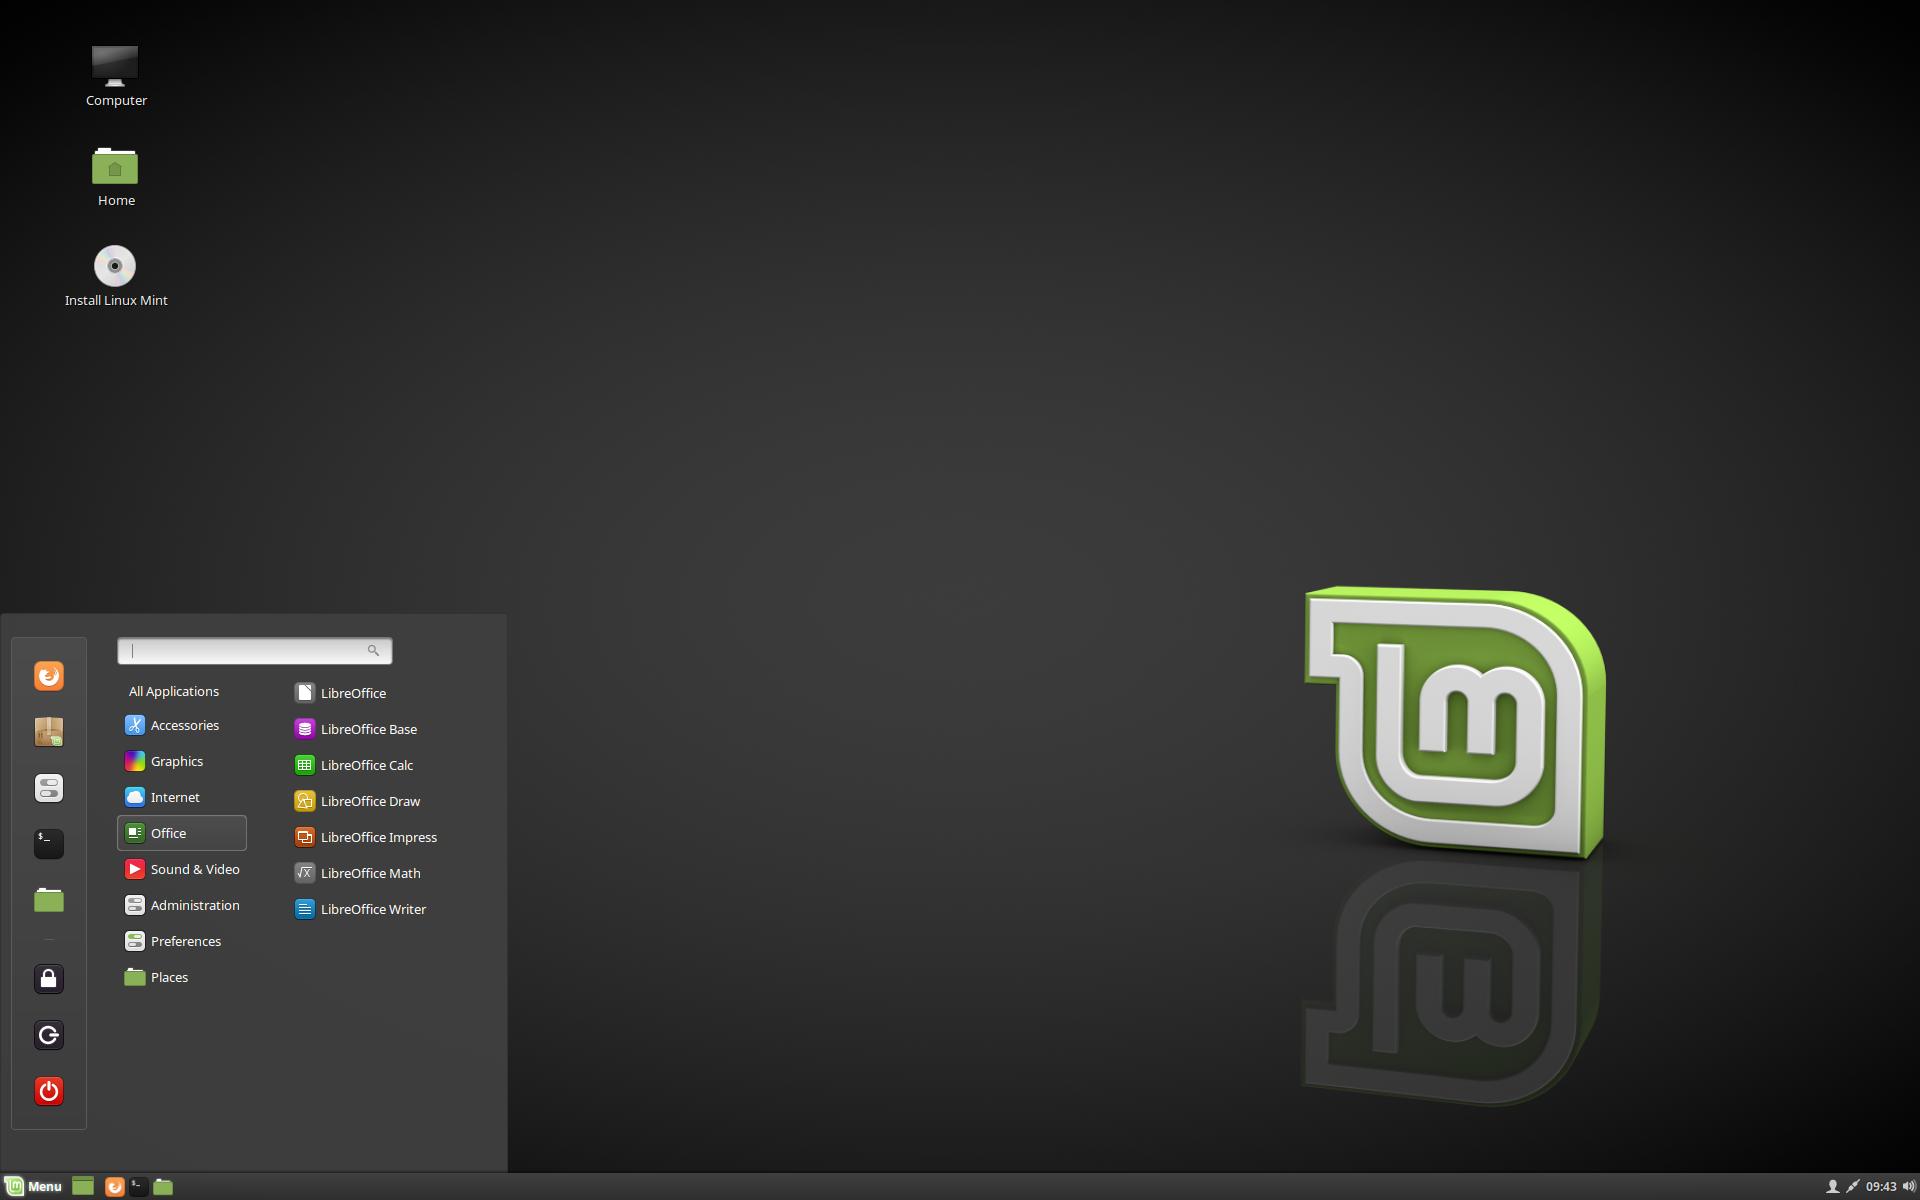 Instalacija Linux Minta — Linux Mint Installation Guide dokumentacija